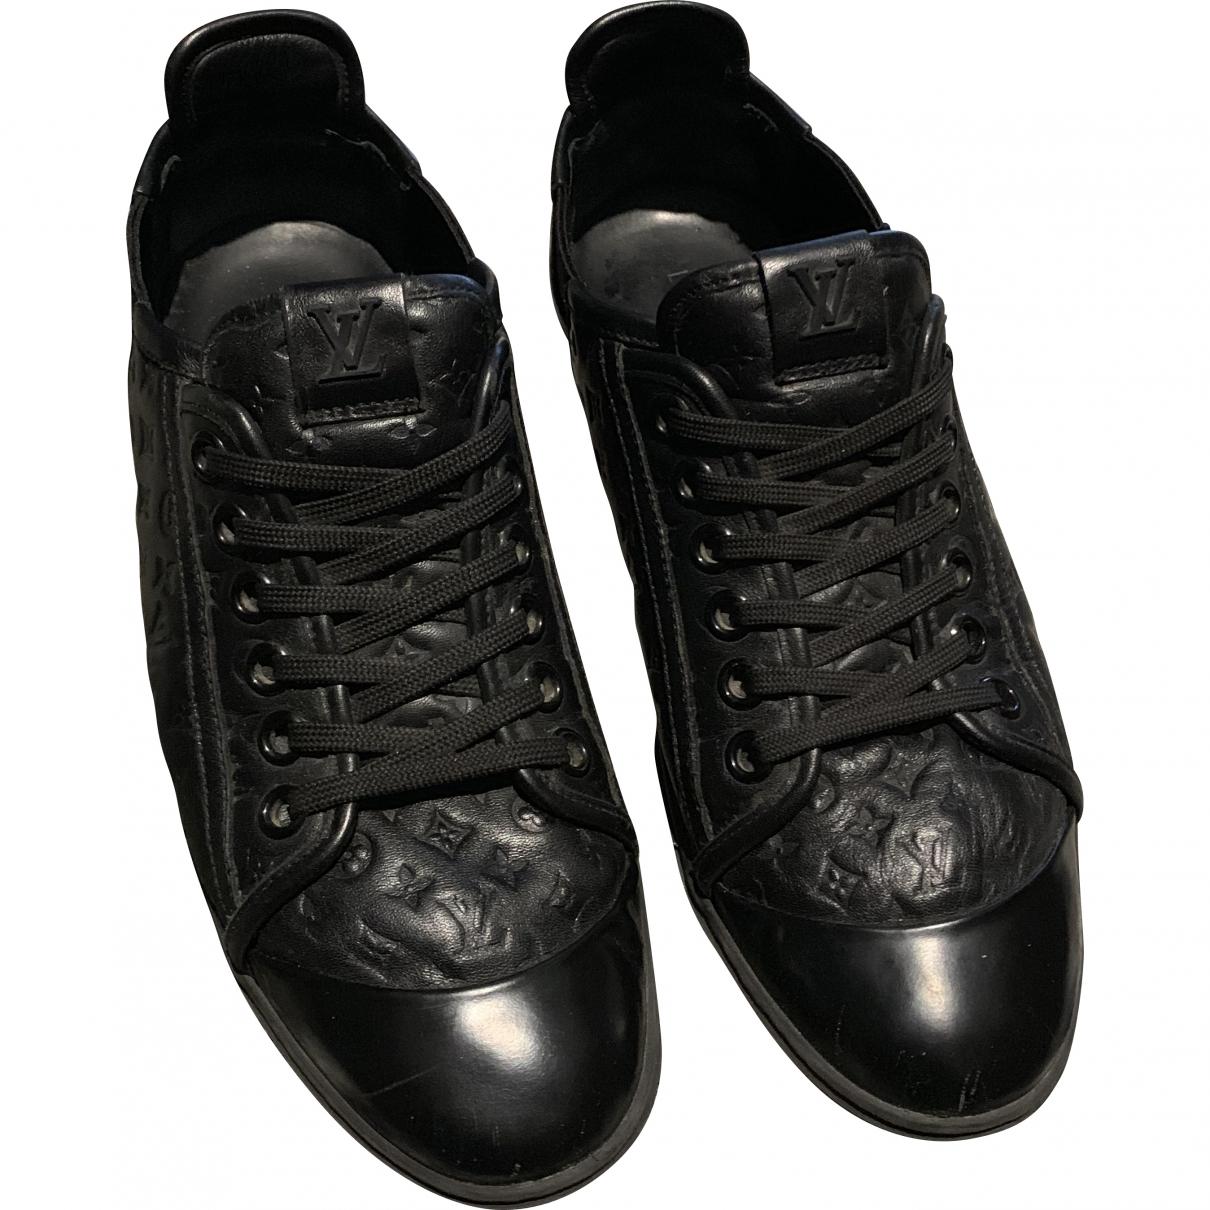 Louis Vuitton \N Black Leather Trainers for Women 39.5 EU